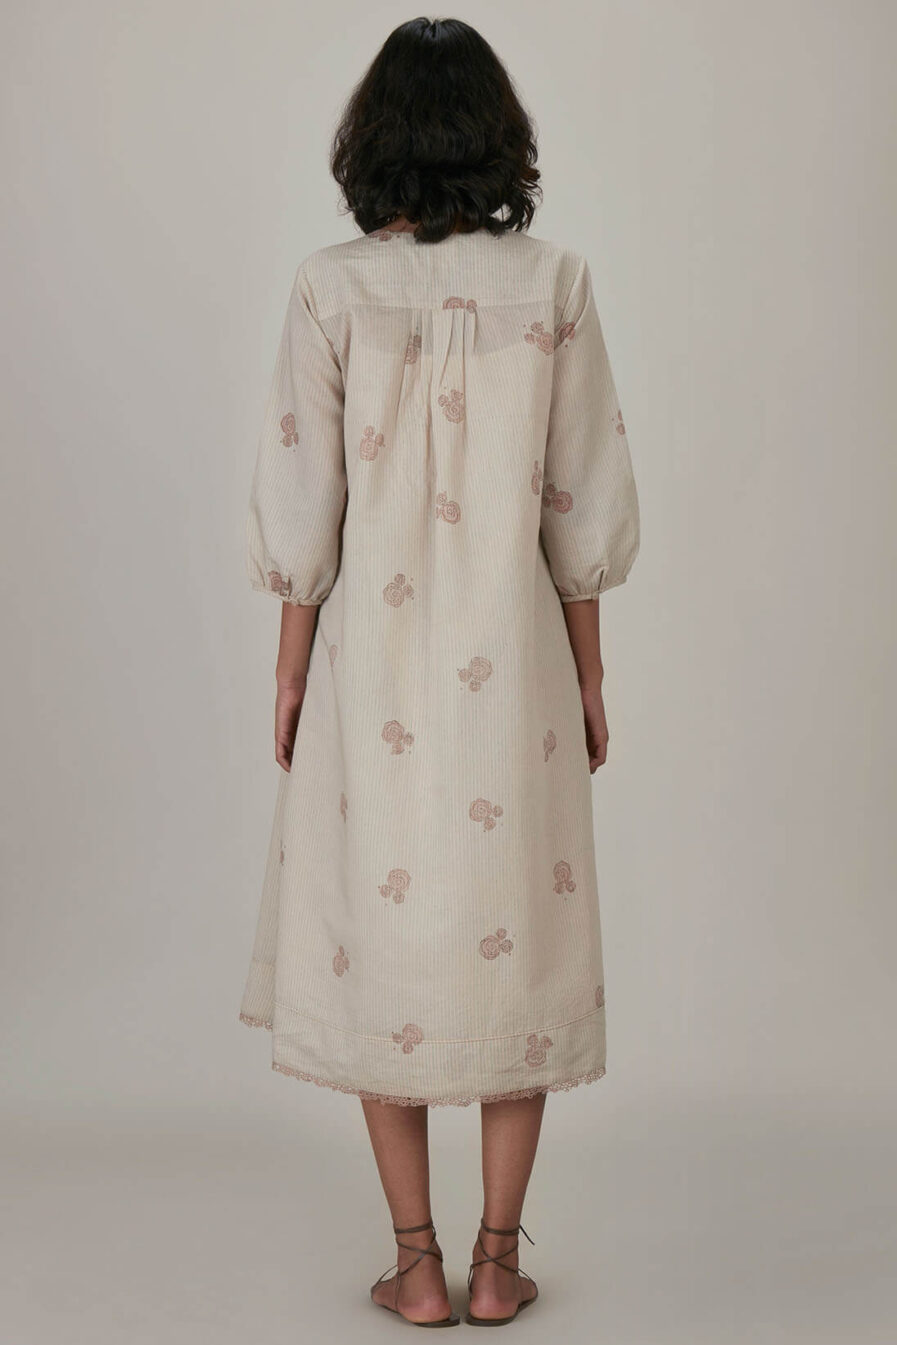 Anavila Blush Block Printed Anne Dress